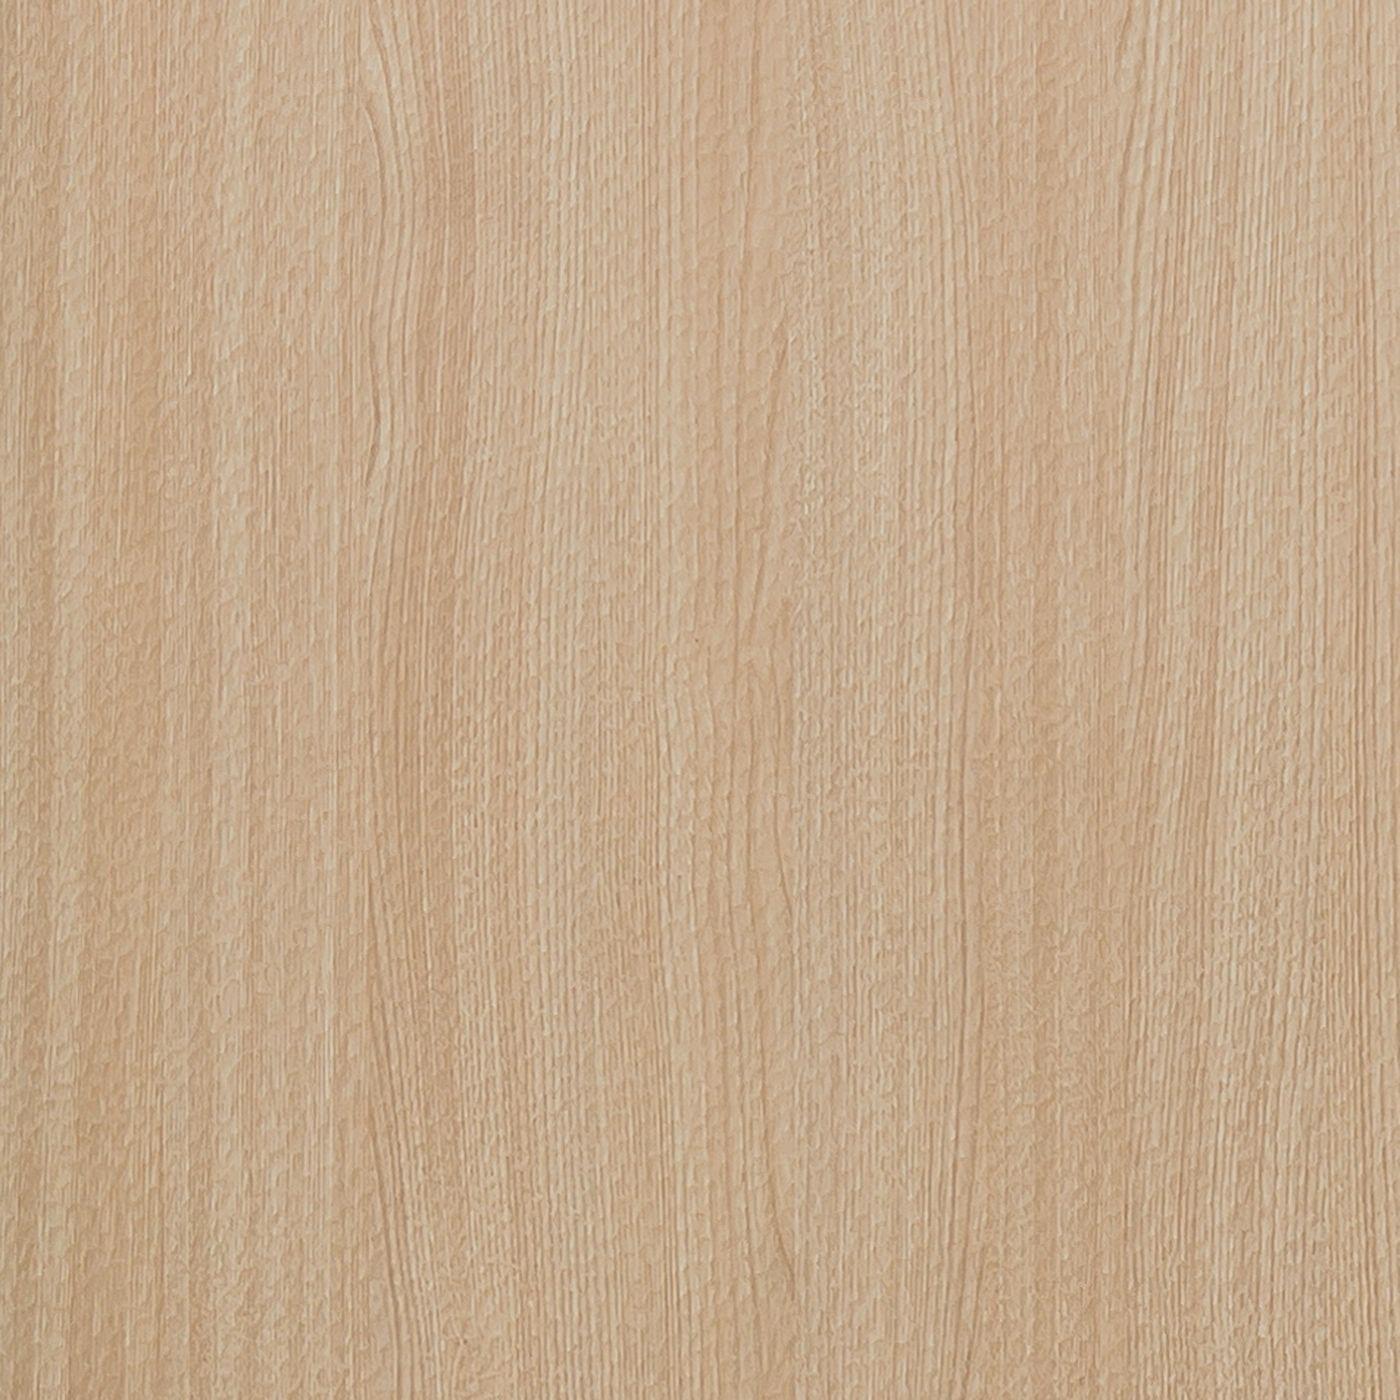 Oak Wood Google Search White Oak Wood Wood Wood Print